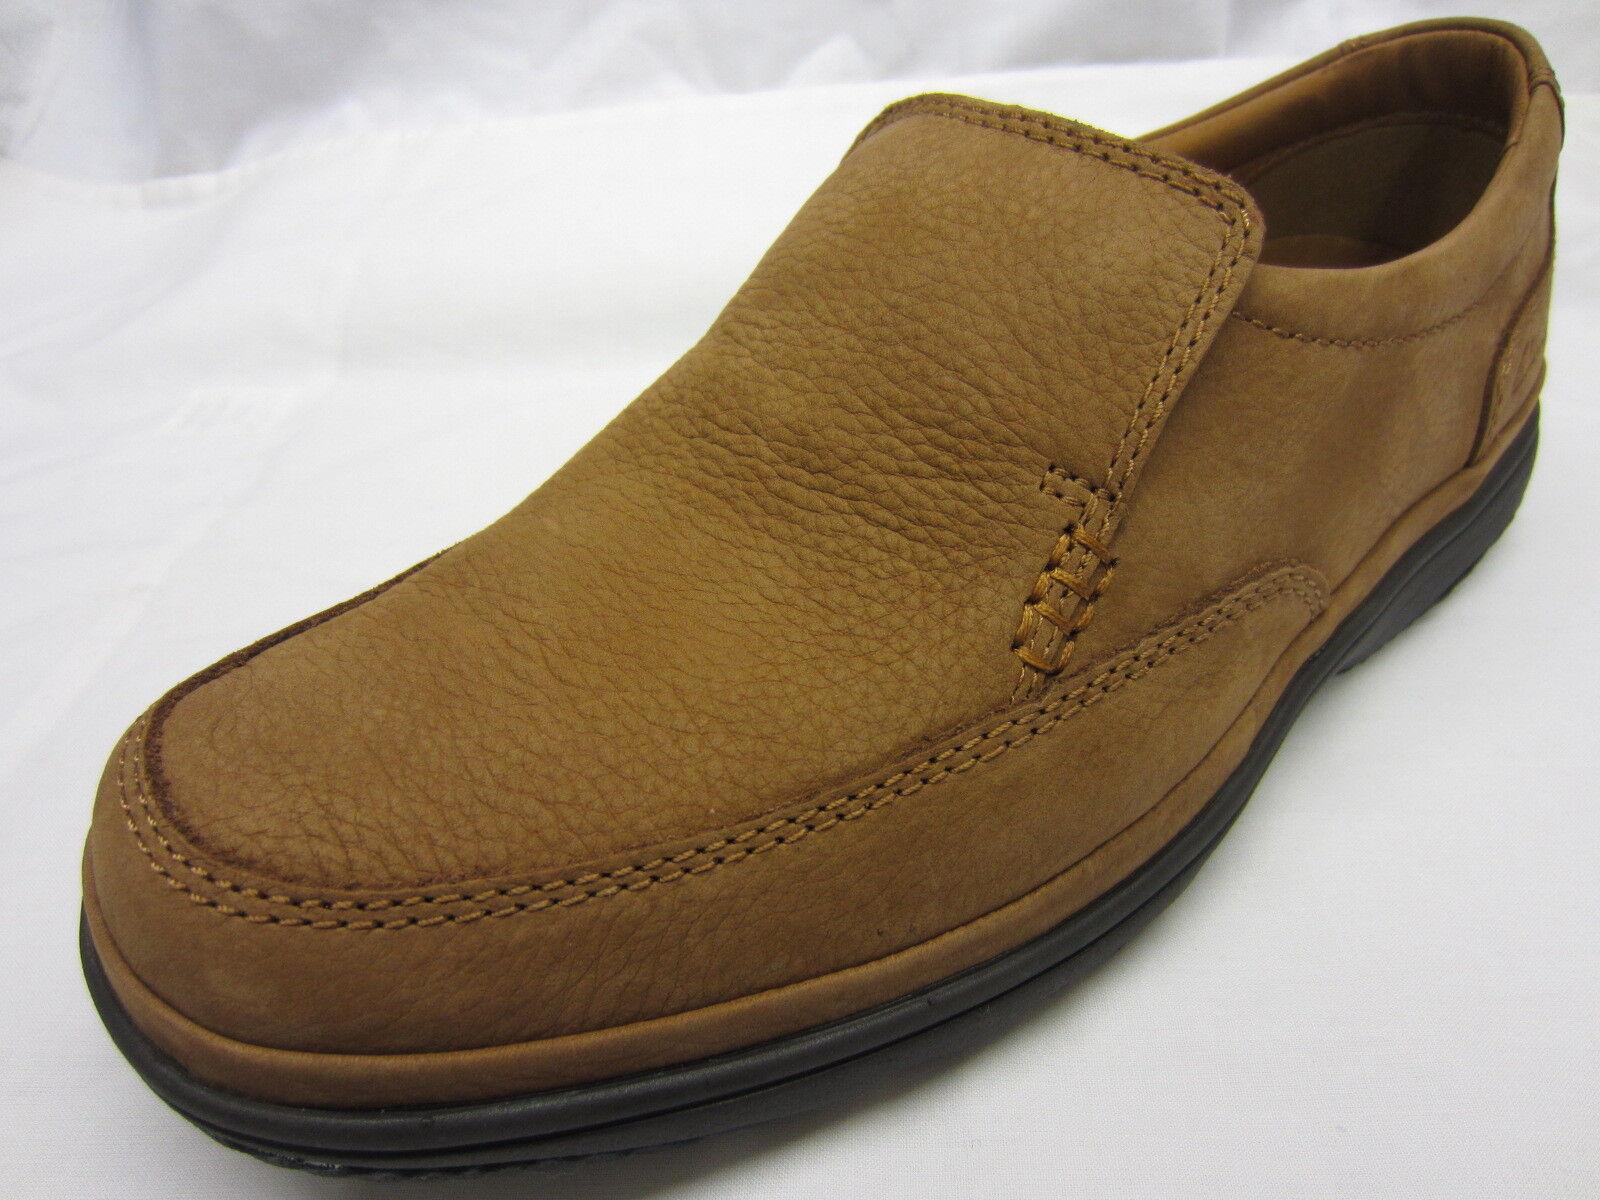 Scarpe casual da uomo  Clarks 'Swift Step' uomos Tan Nubuck Scarpe Slip-On Di Pelle